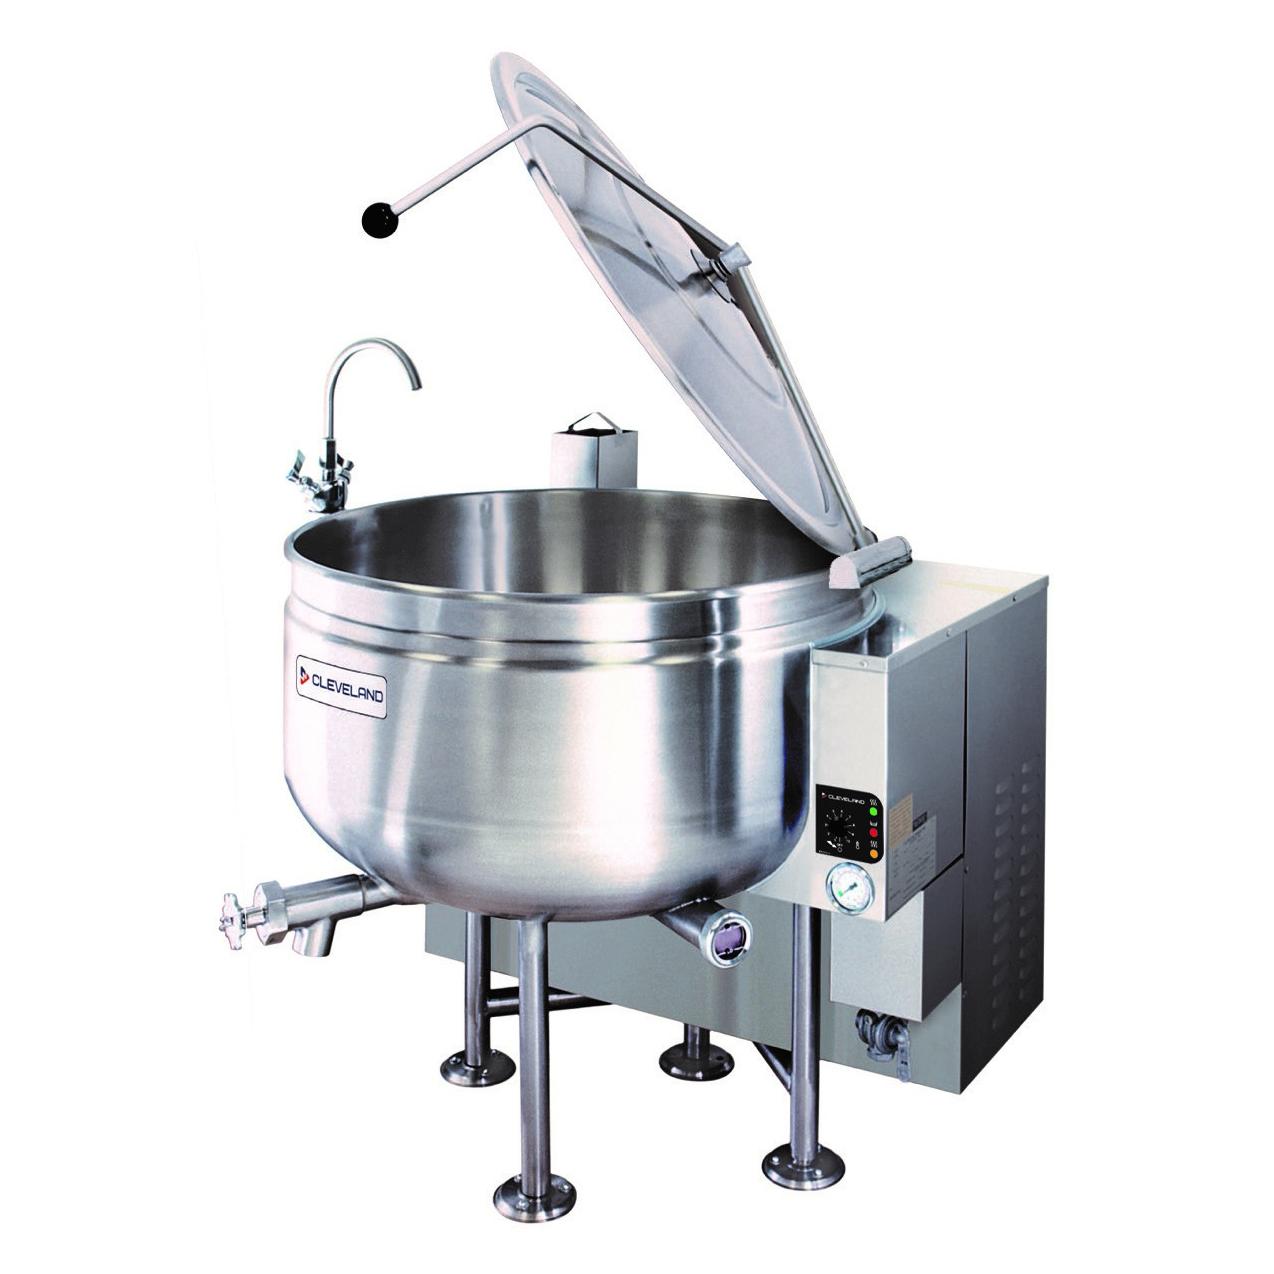 Cleveland Range KGL40SH kettle, gas, stationary